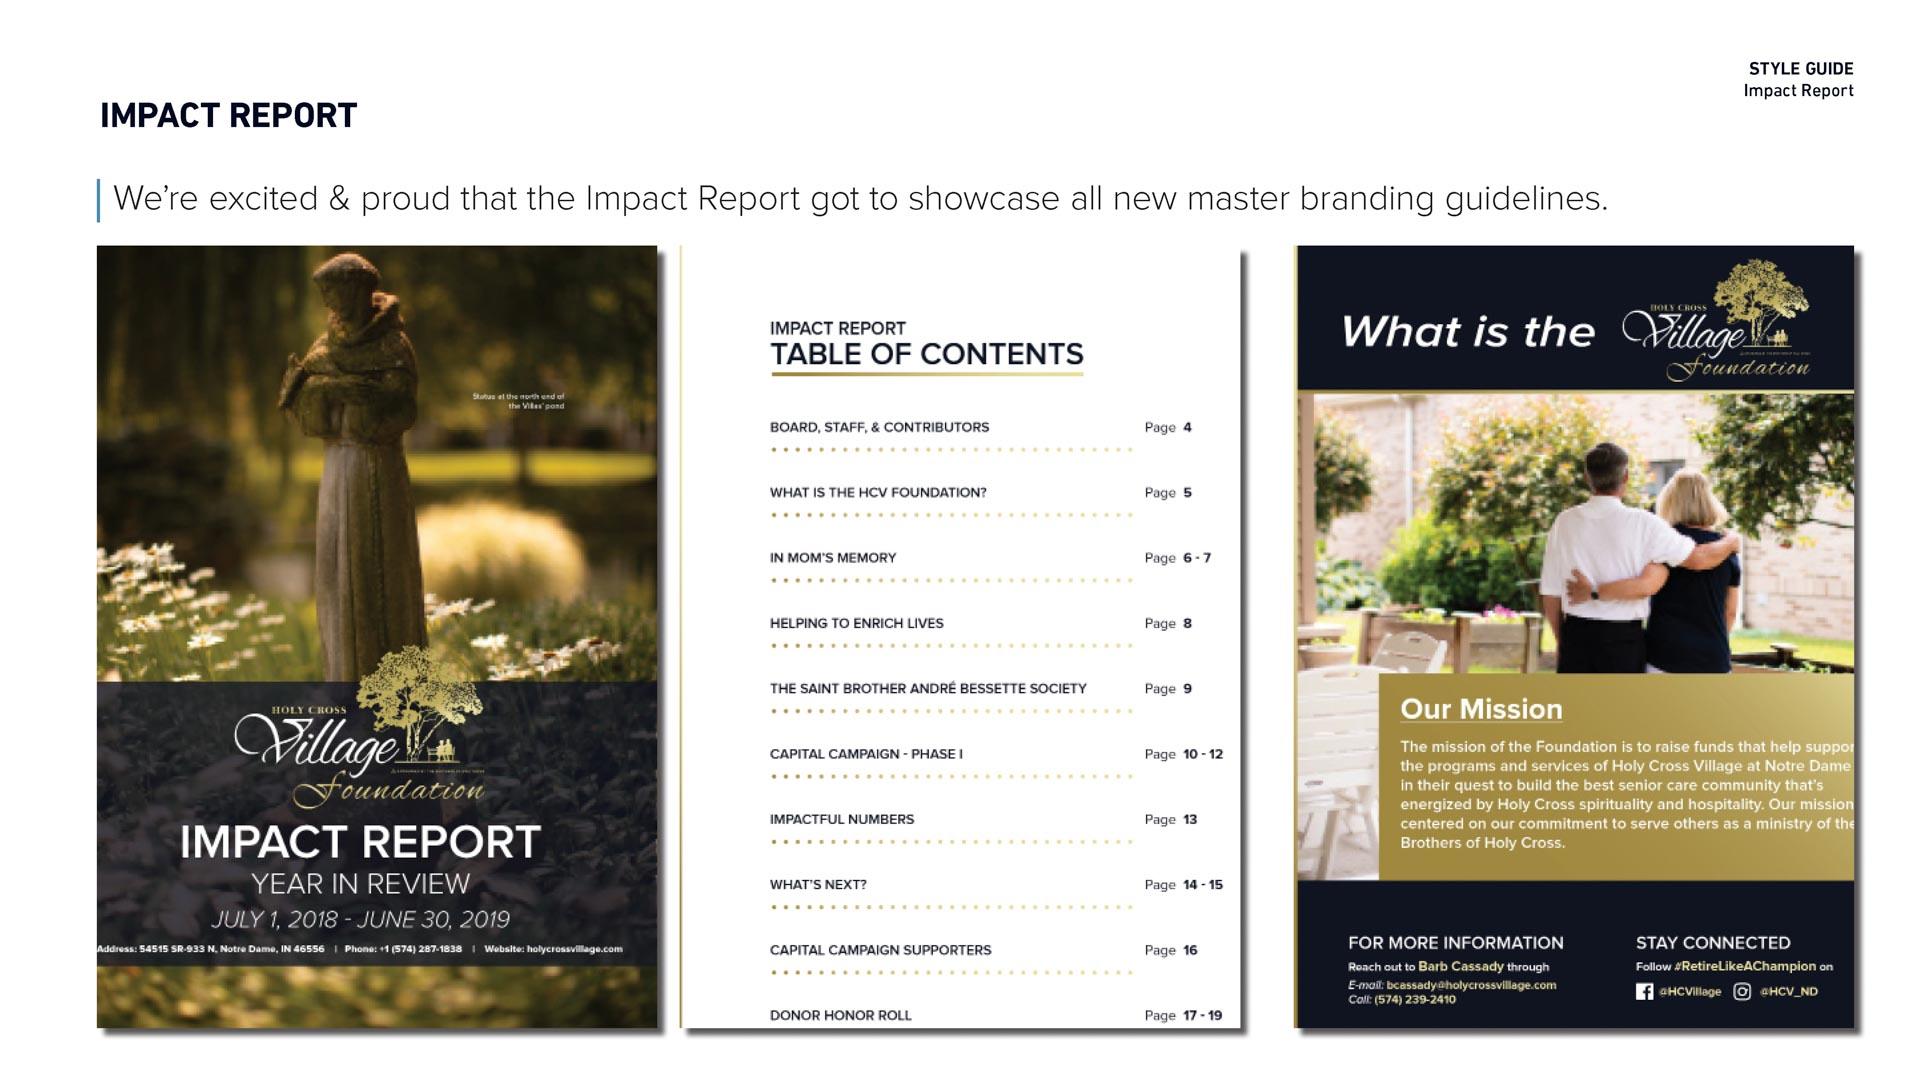 Holy Cross Village's Impact Report